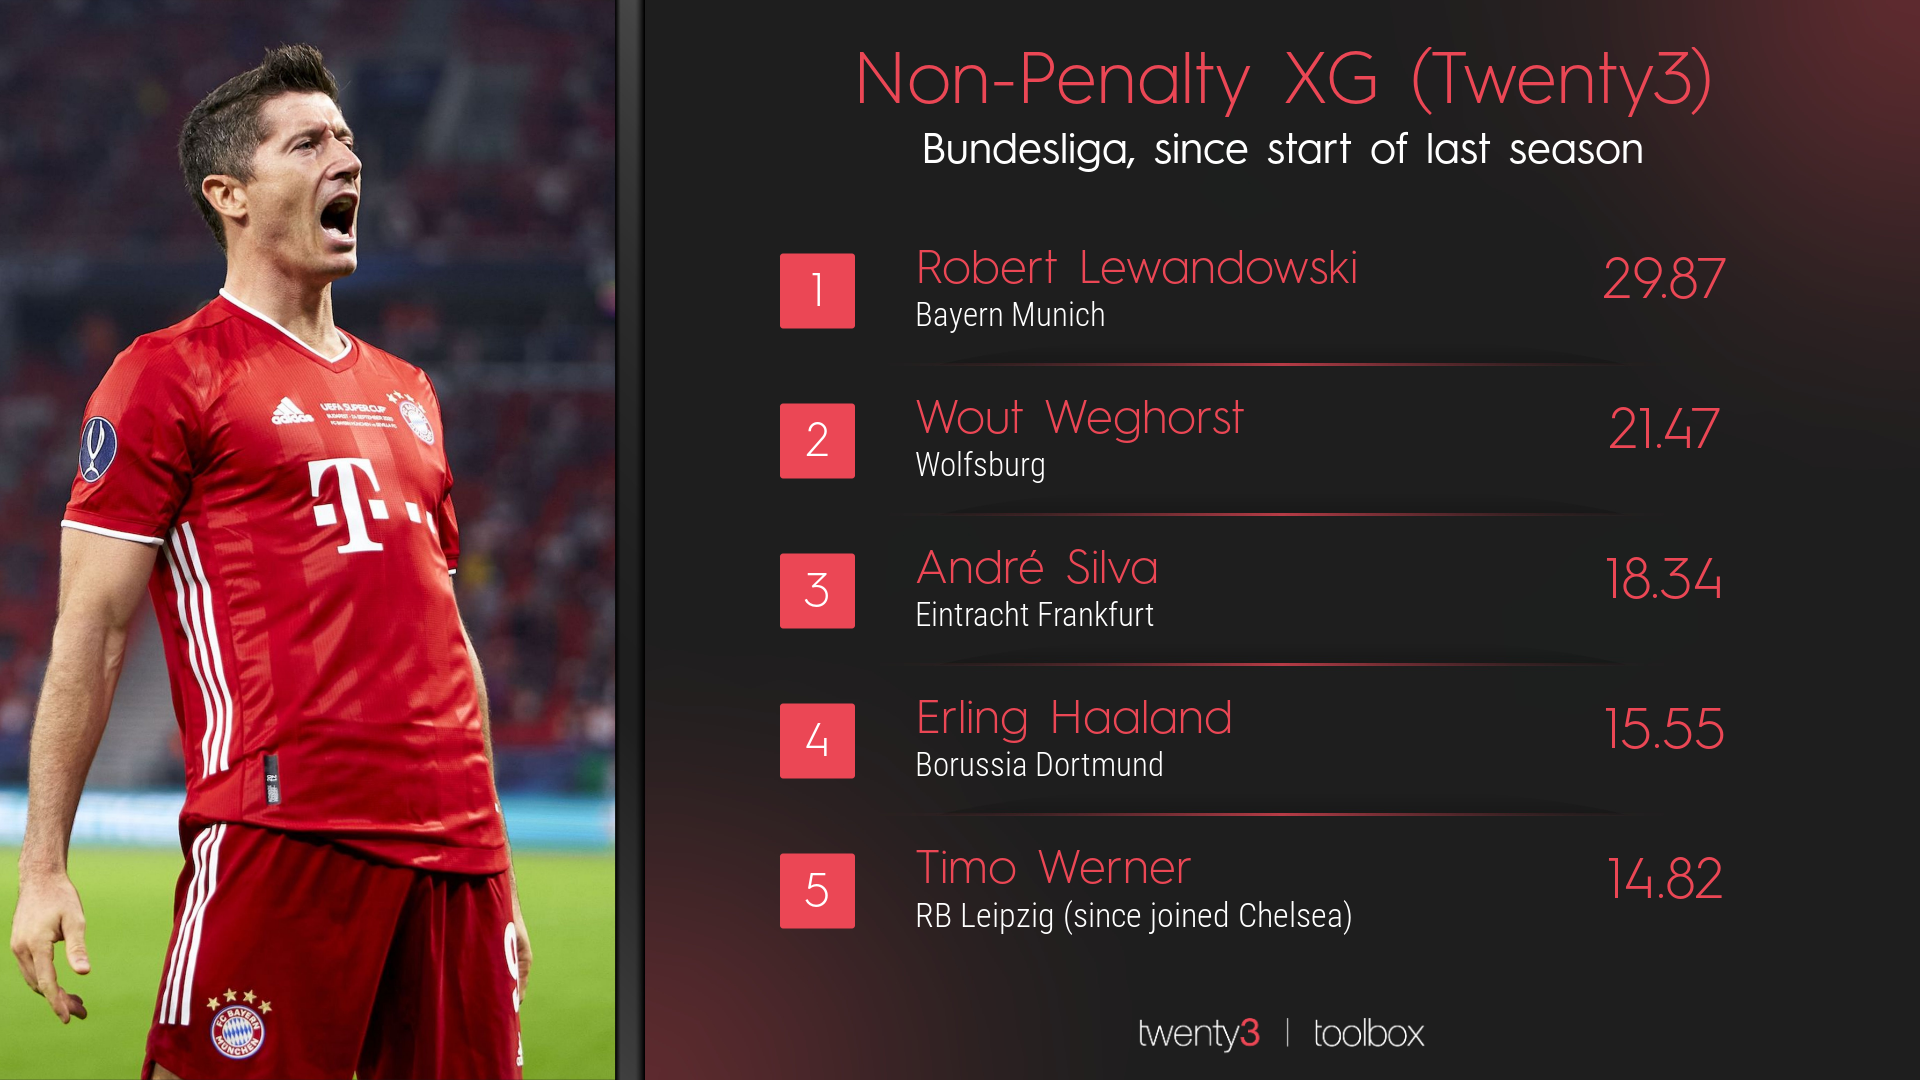 Football metrics: A Twenty3 ranking graphic looking at non-penalty xG in the Bundesliga.